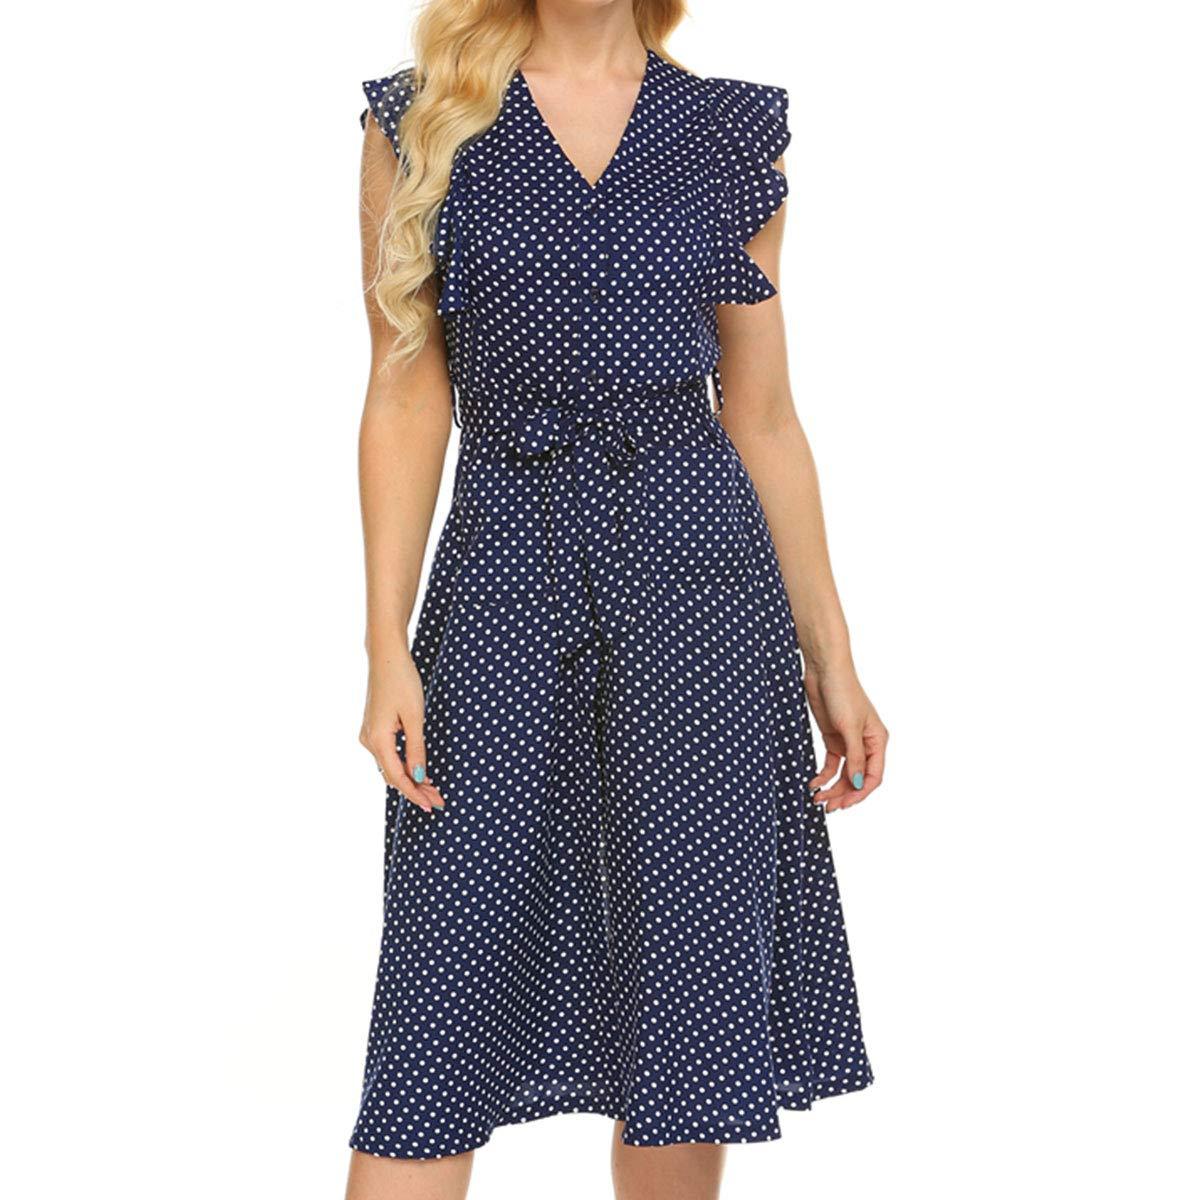 Sailor Dresses, Nautical Theme Dress, WW2 Dresses OMSJ Womens Cute Dresses Polka Dot Swing Midi Dress with Pockets $21.99 AT vintagedancer.com